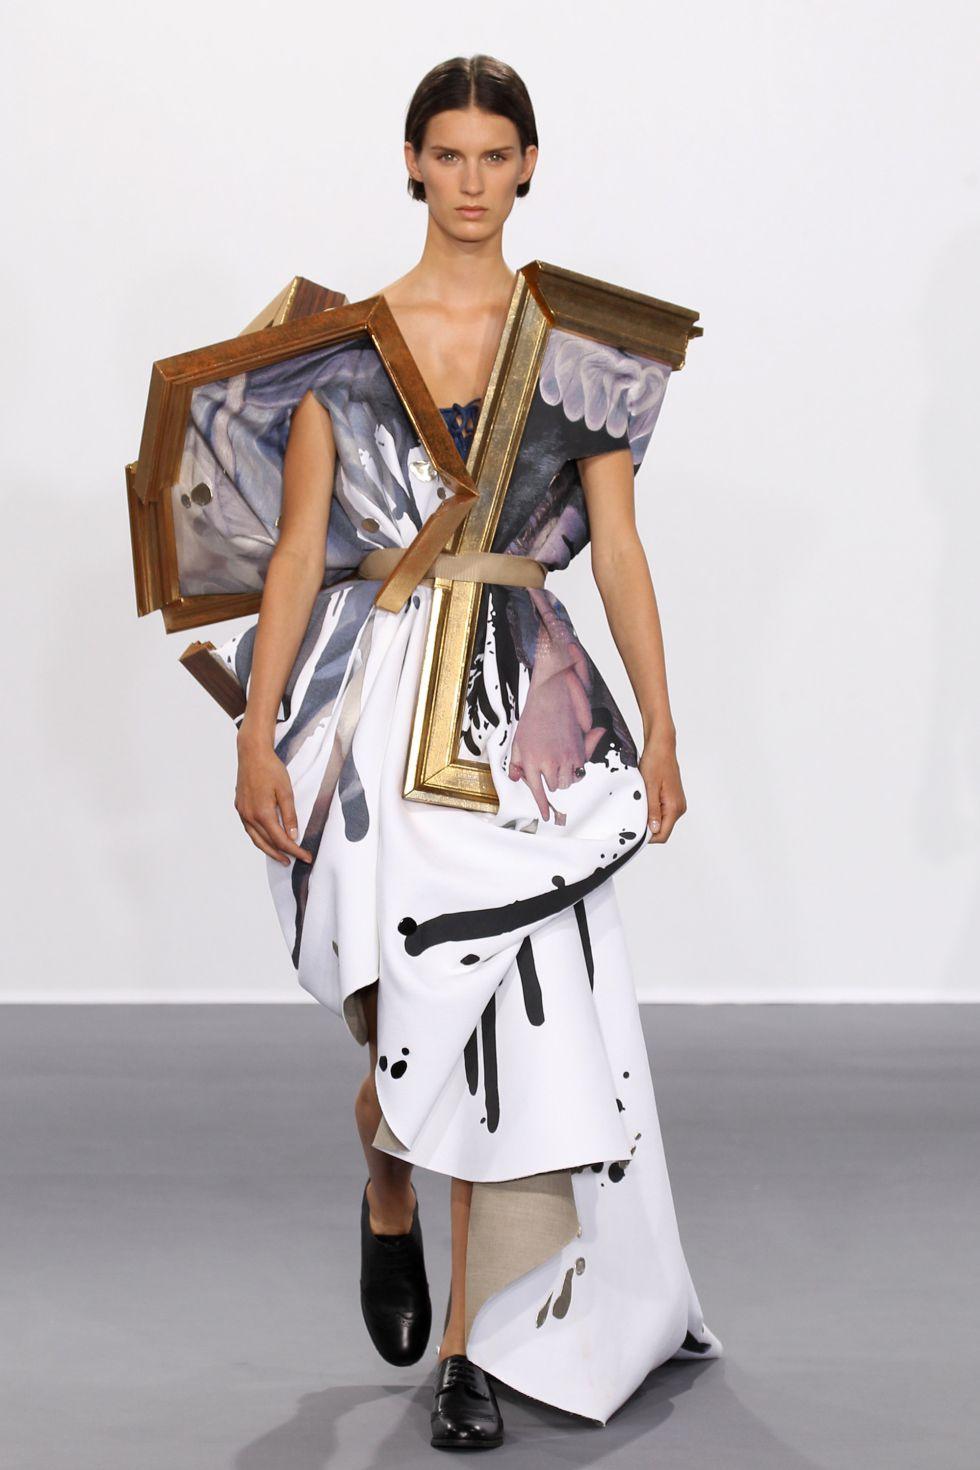 Fotos: La moda \'agénero\' llega a la alta costura | Estilo | EL PAÍS